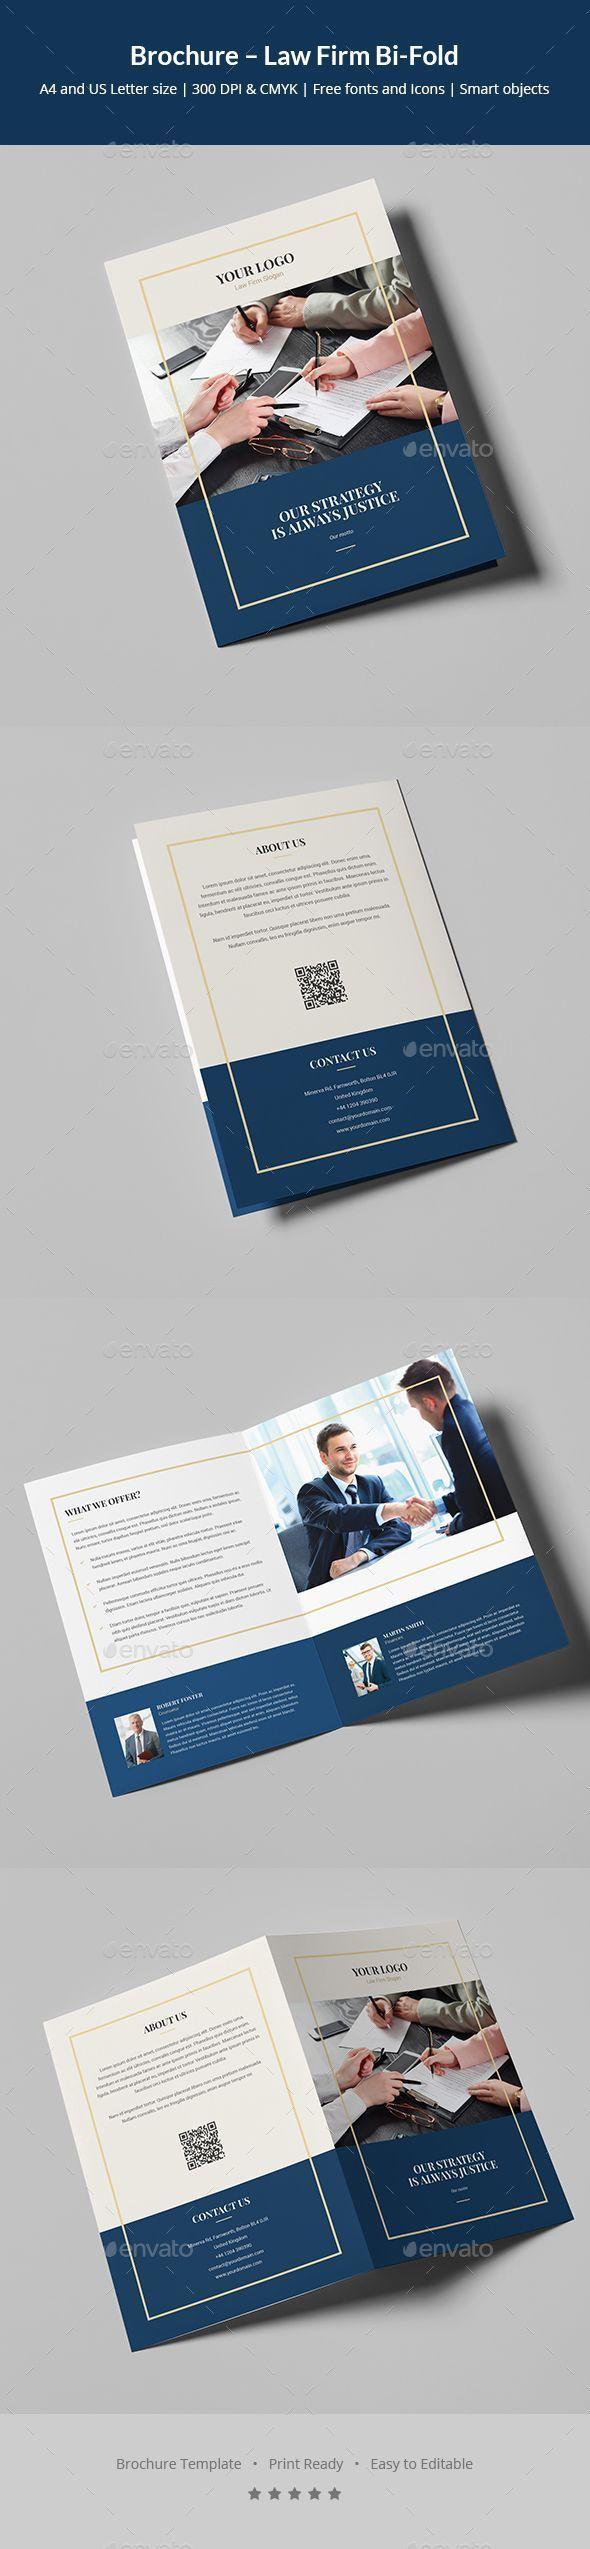 Law Firm Bi-Fold Brochure Template PSD - A4 and US Letter Size #FinanceBrochure #lawyersandadvocates